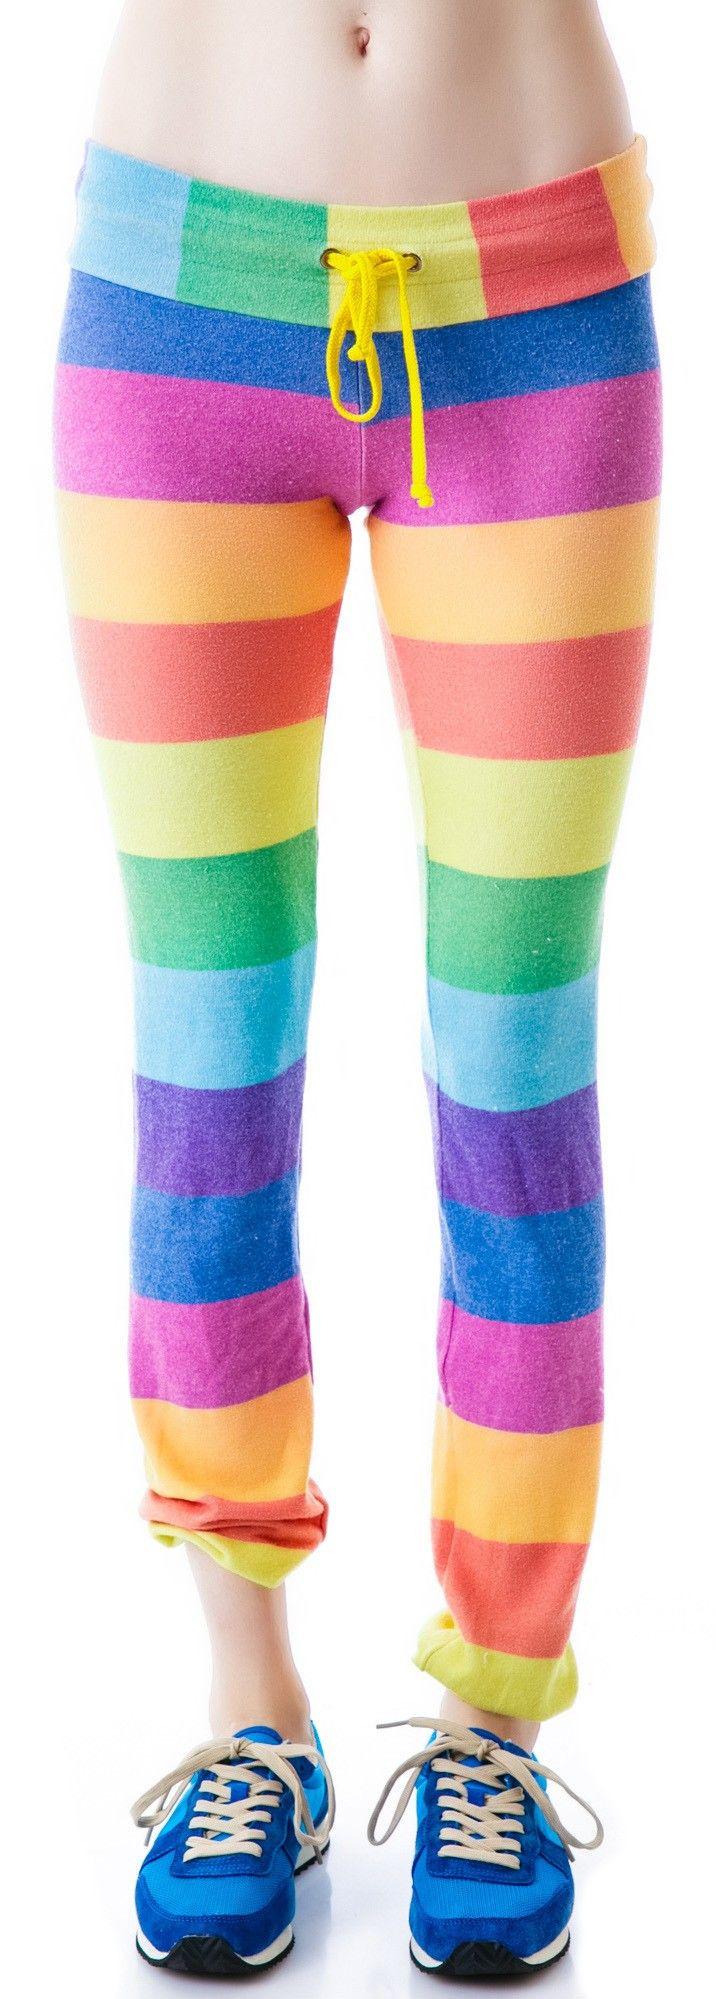 Wildfox Couture 70's Rainbow Malibu Skinny Sweats | The House of Beccaria#